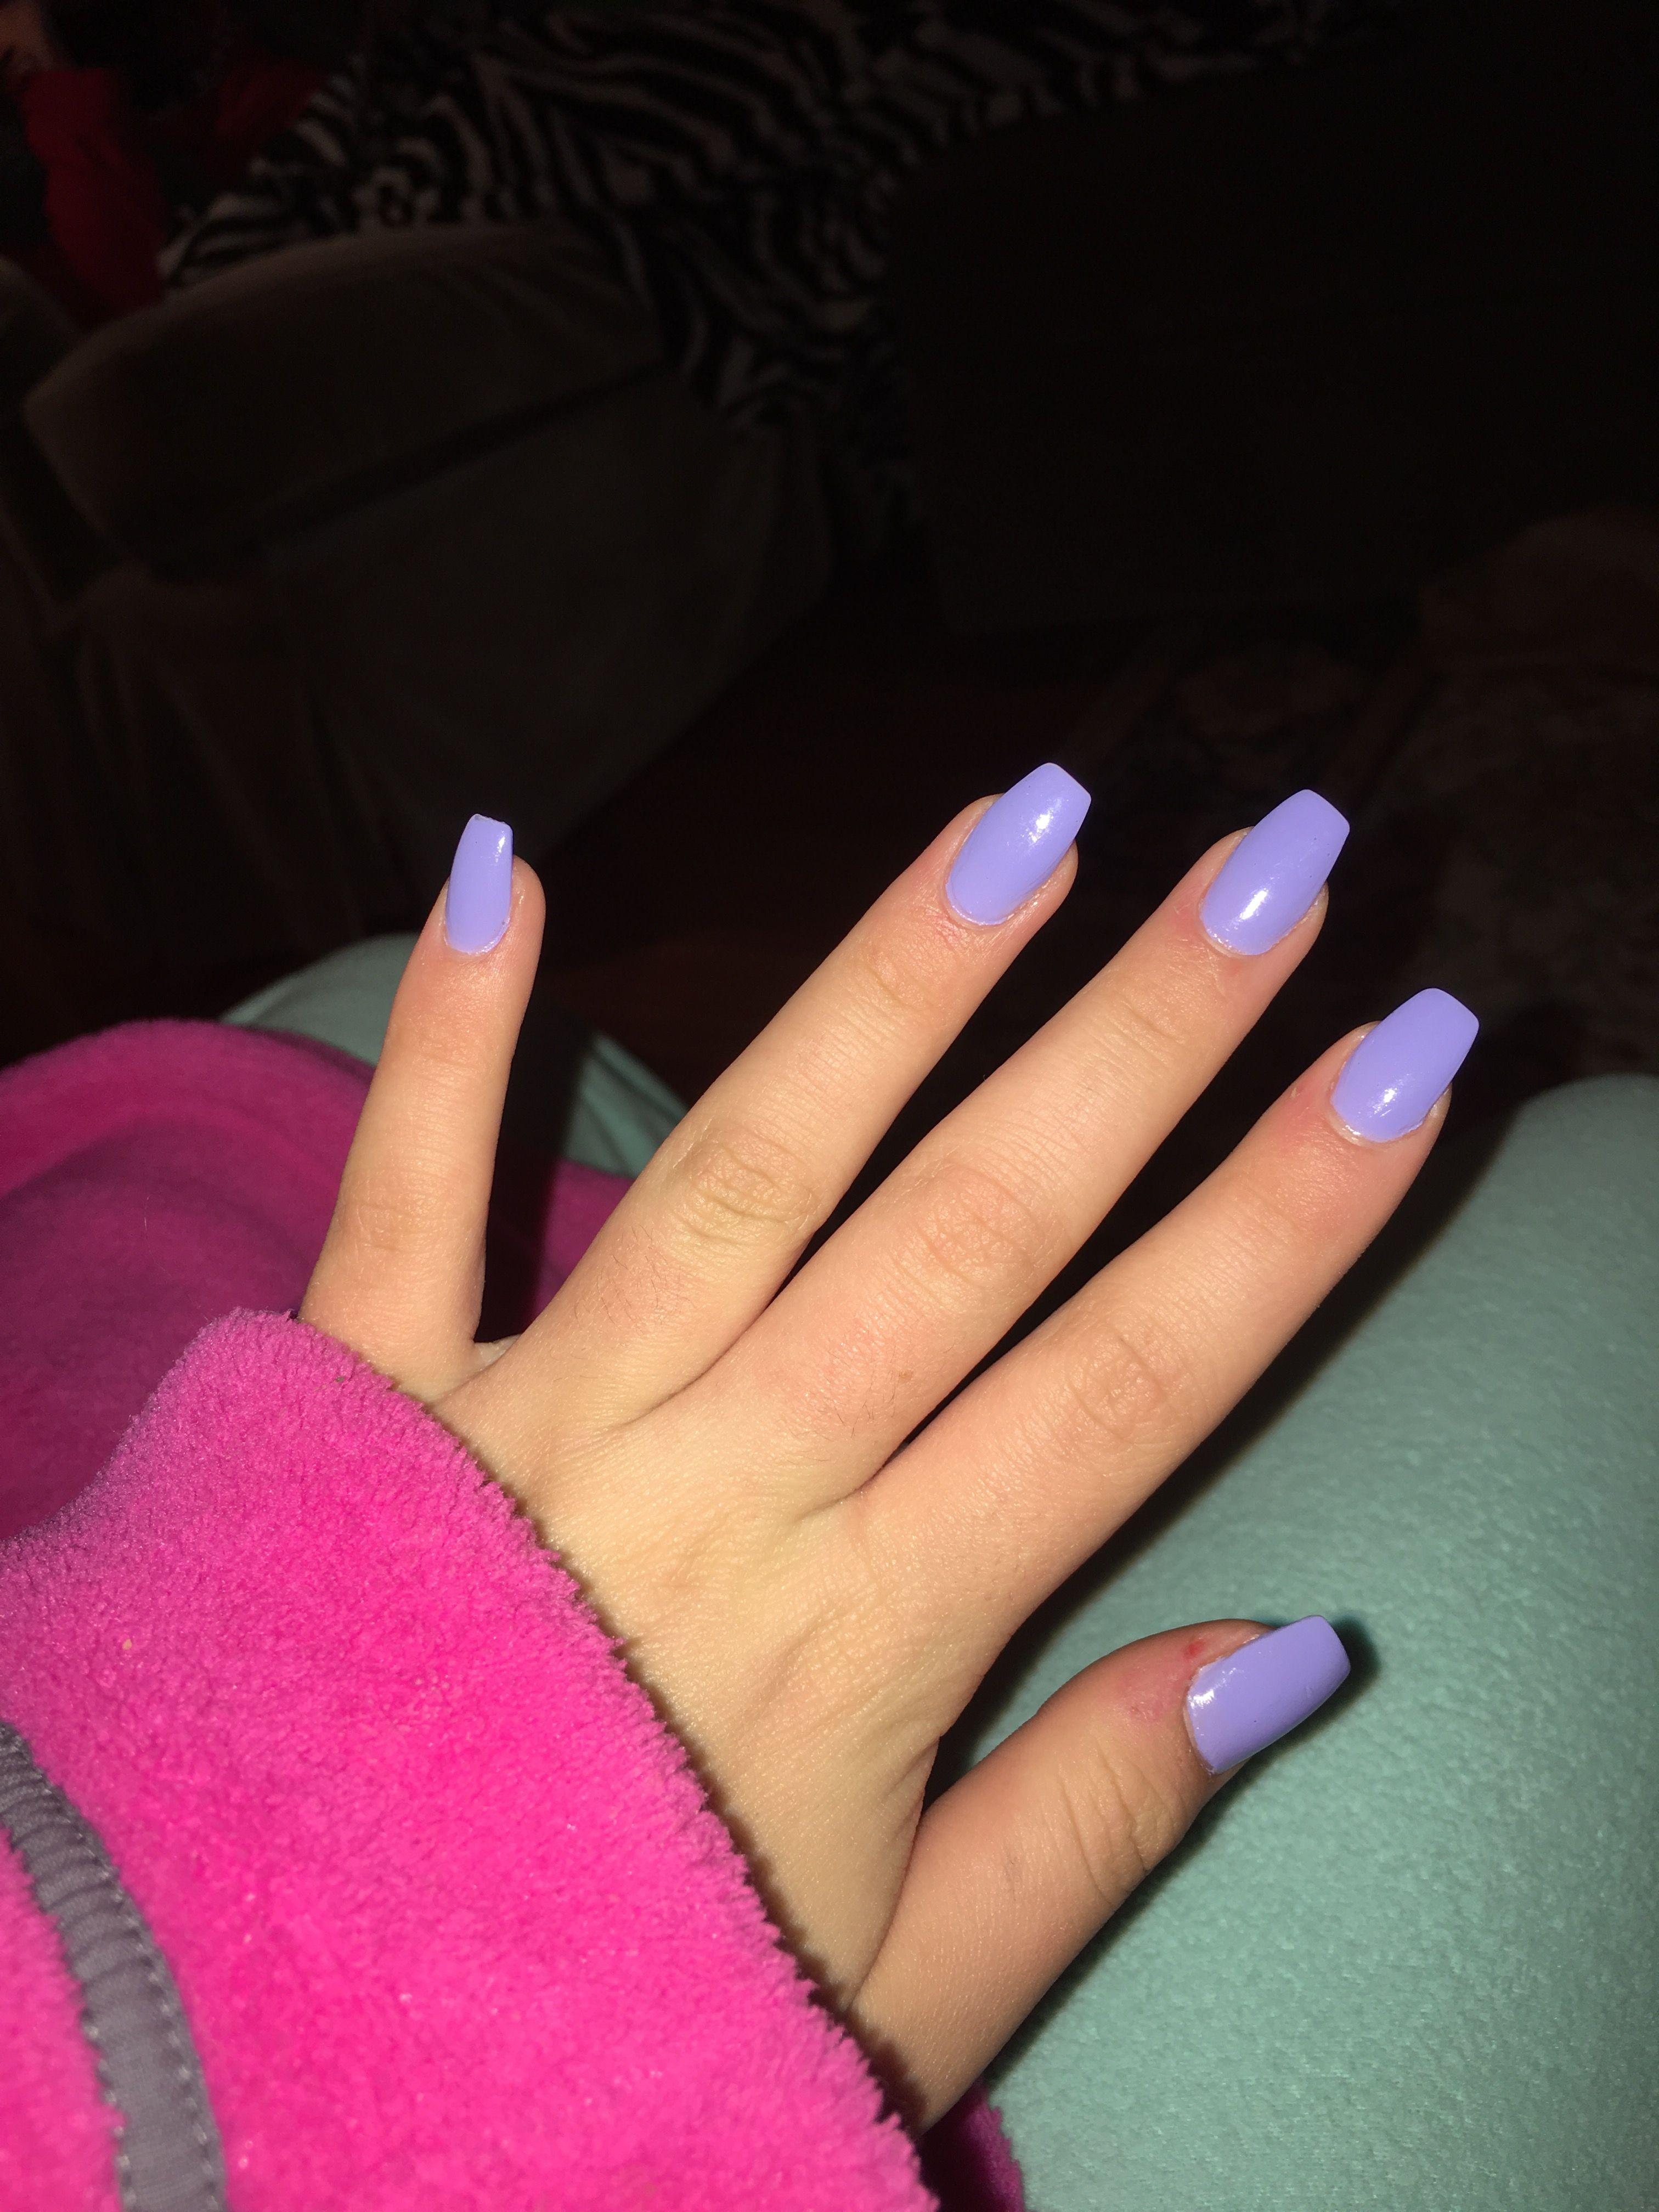 Short Lavender Coffin Nails